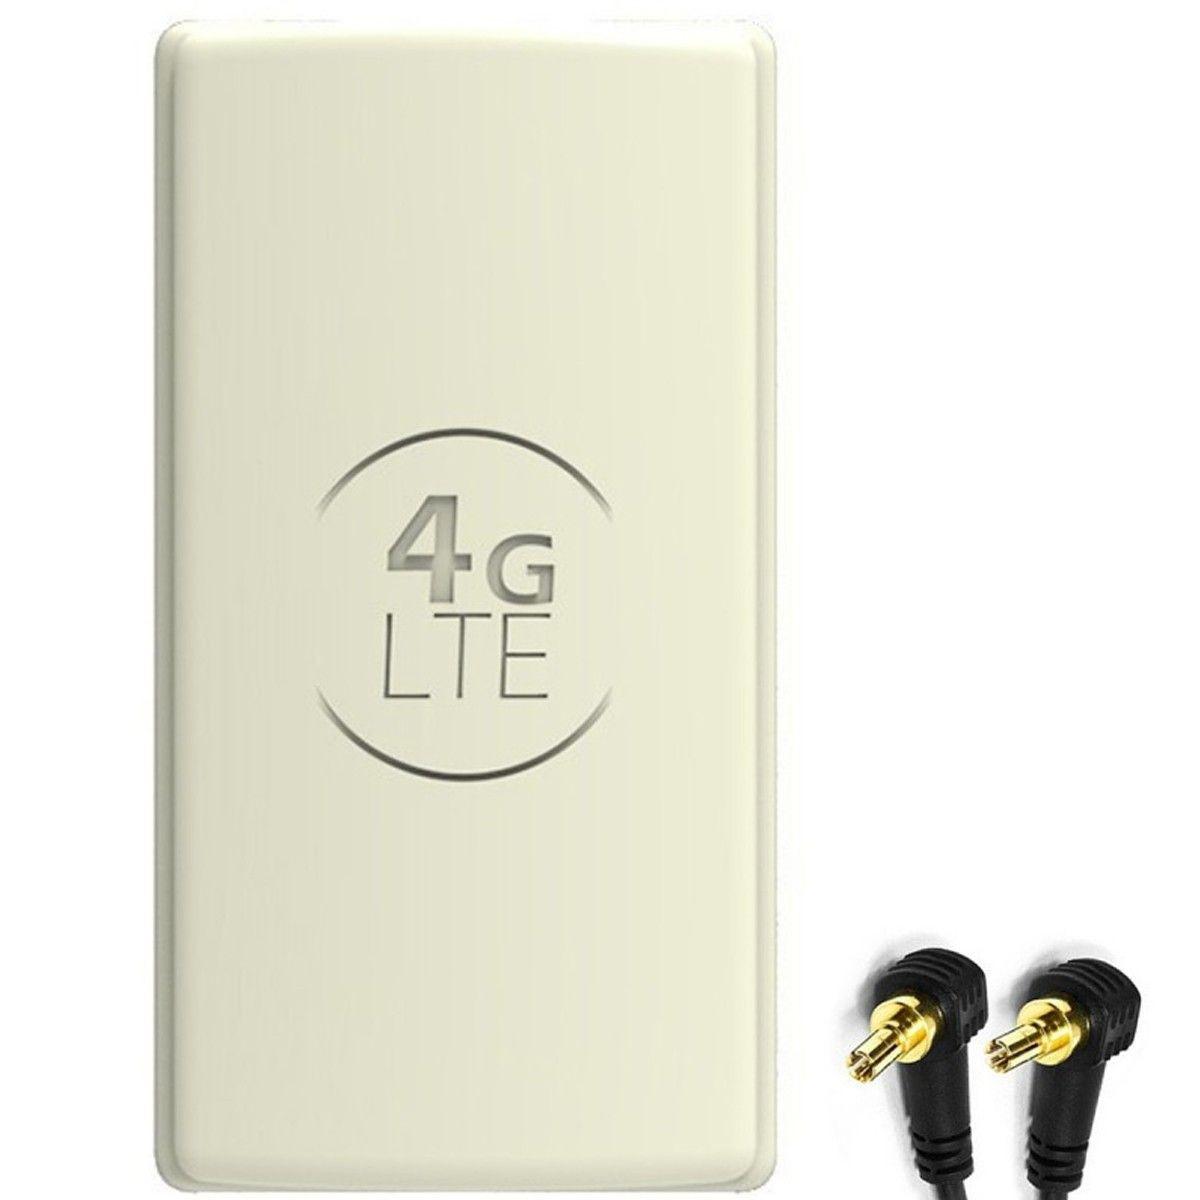 Antena 4G LTE DUAL PANEL 2x25dBi + 2x15m SZARA + 2x CRC9